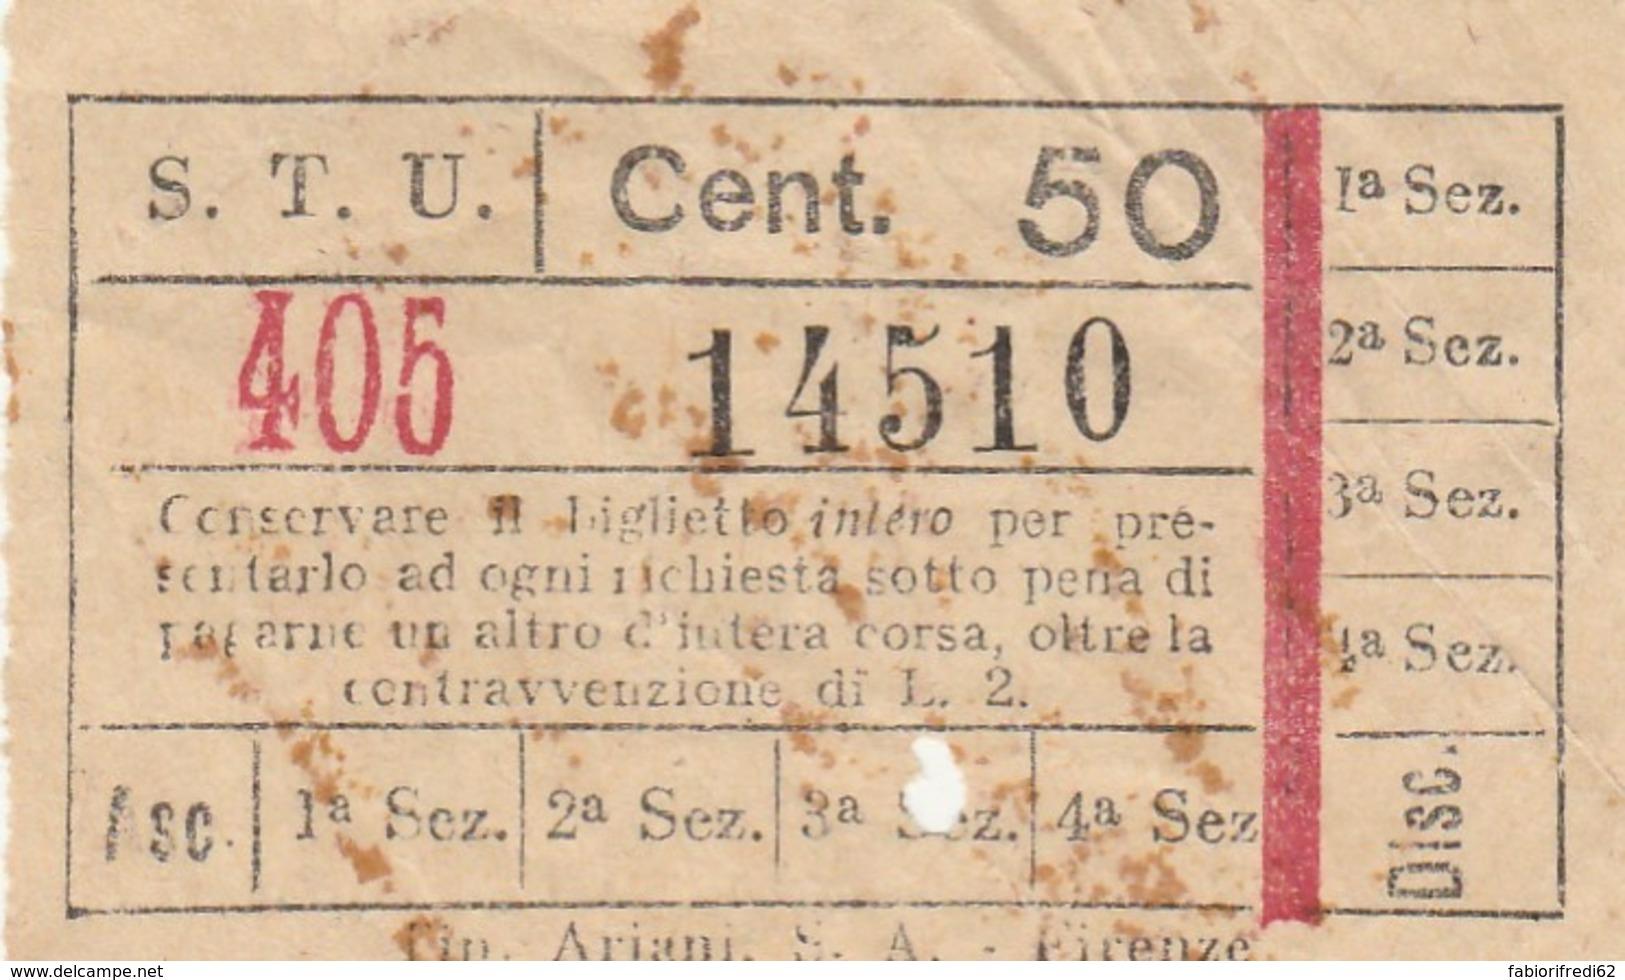 STU CENT.50 BIGLIETTO AUTOBUS (FX377 - Bus